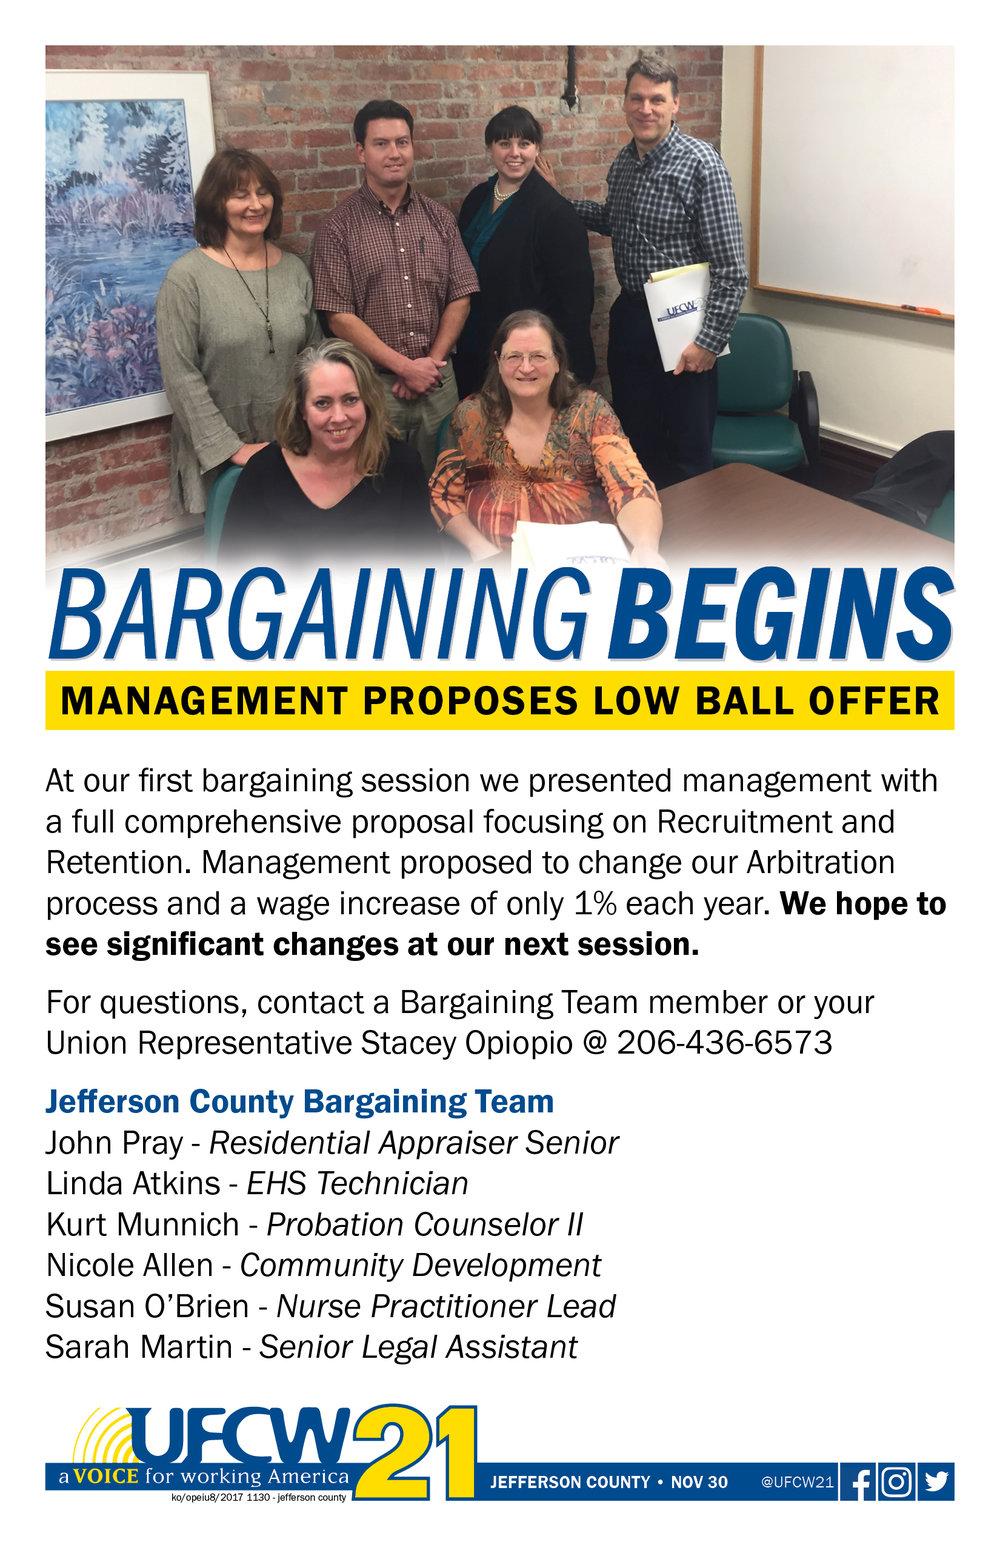 2017 1130 - Jefferson County - Bargaining Begins.jpg